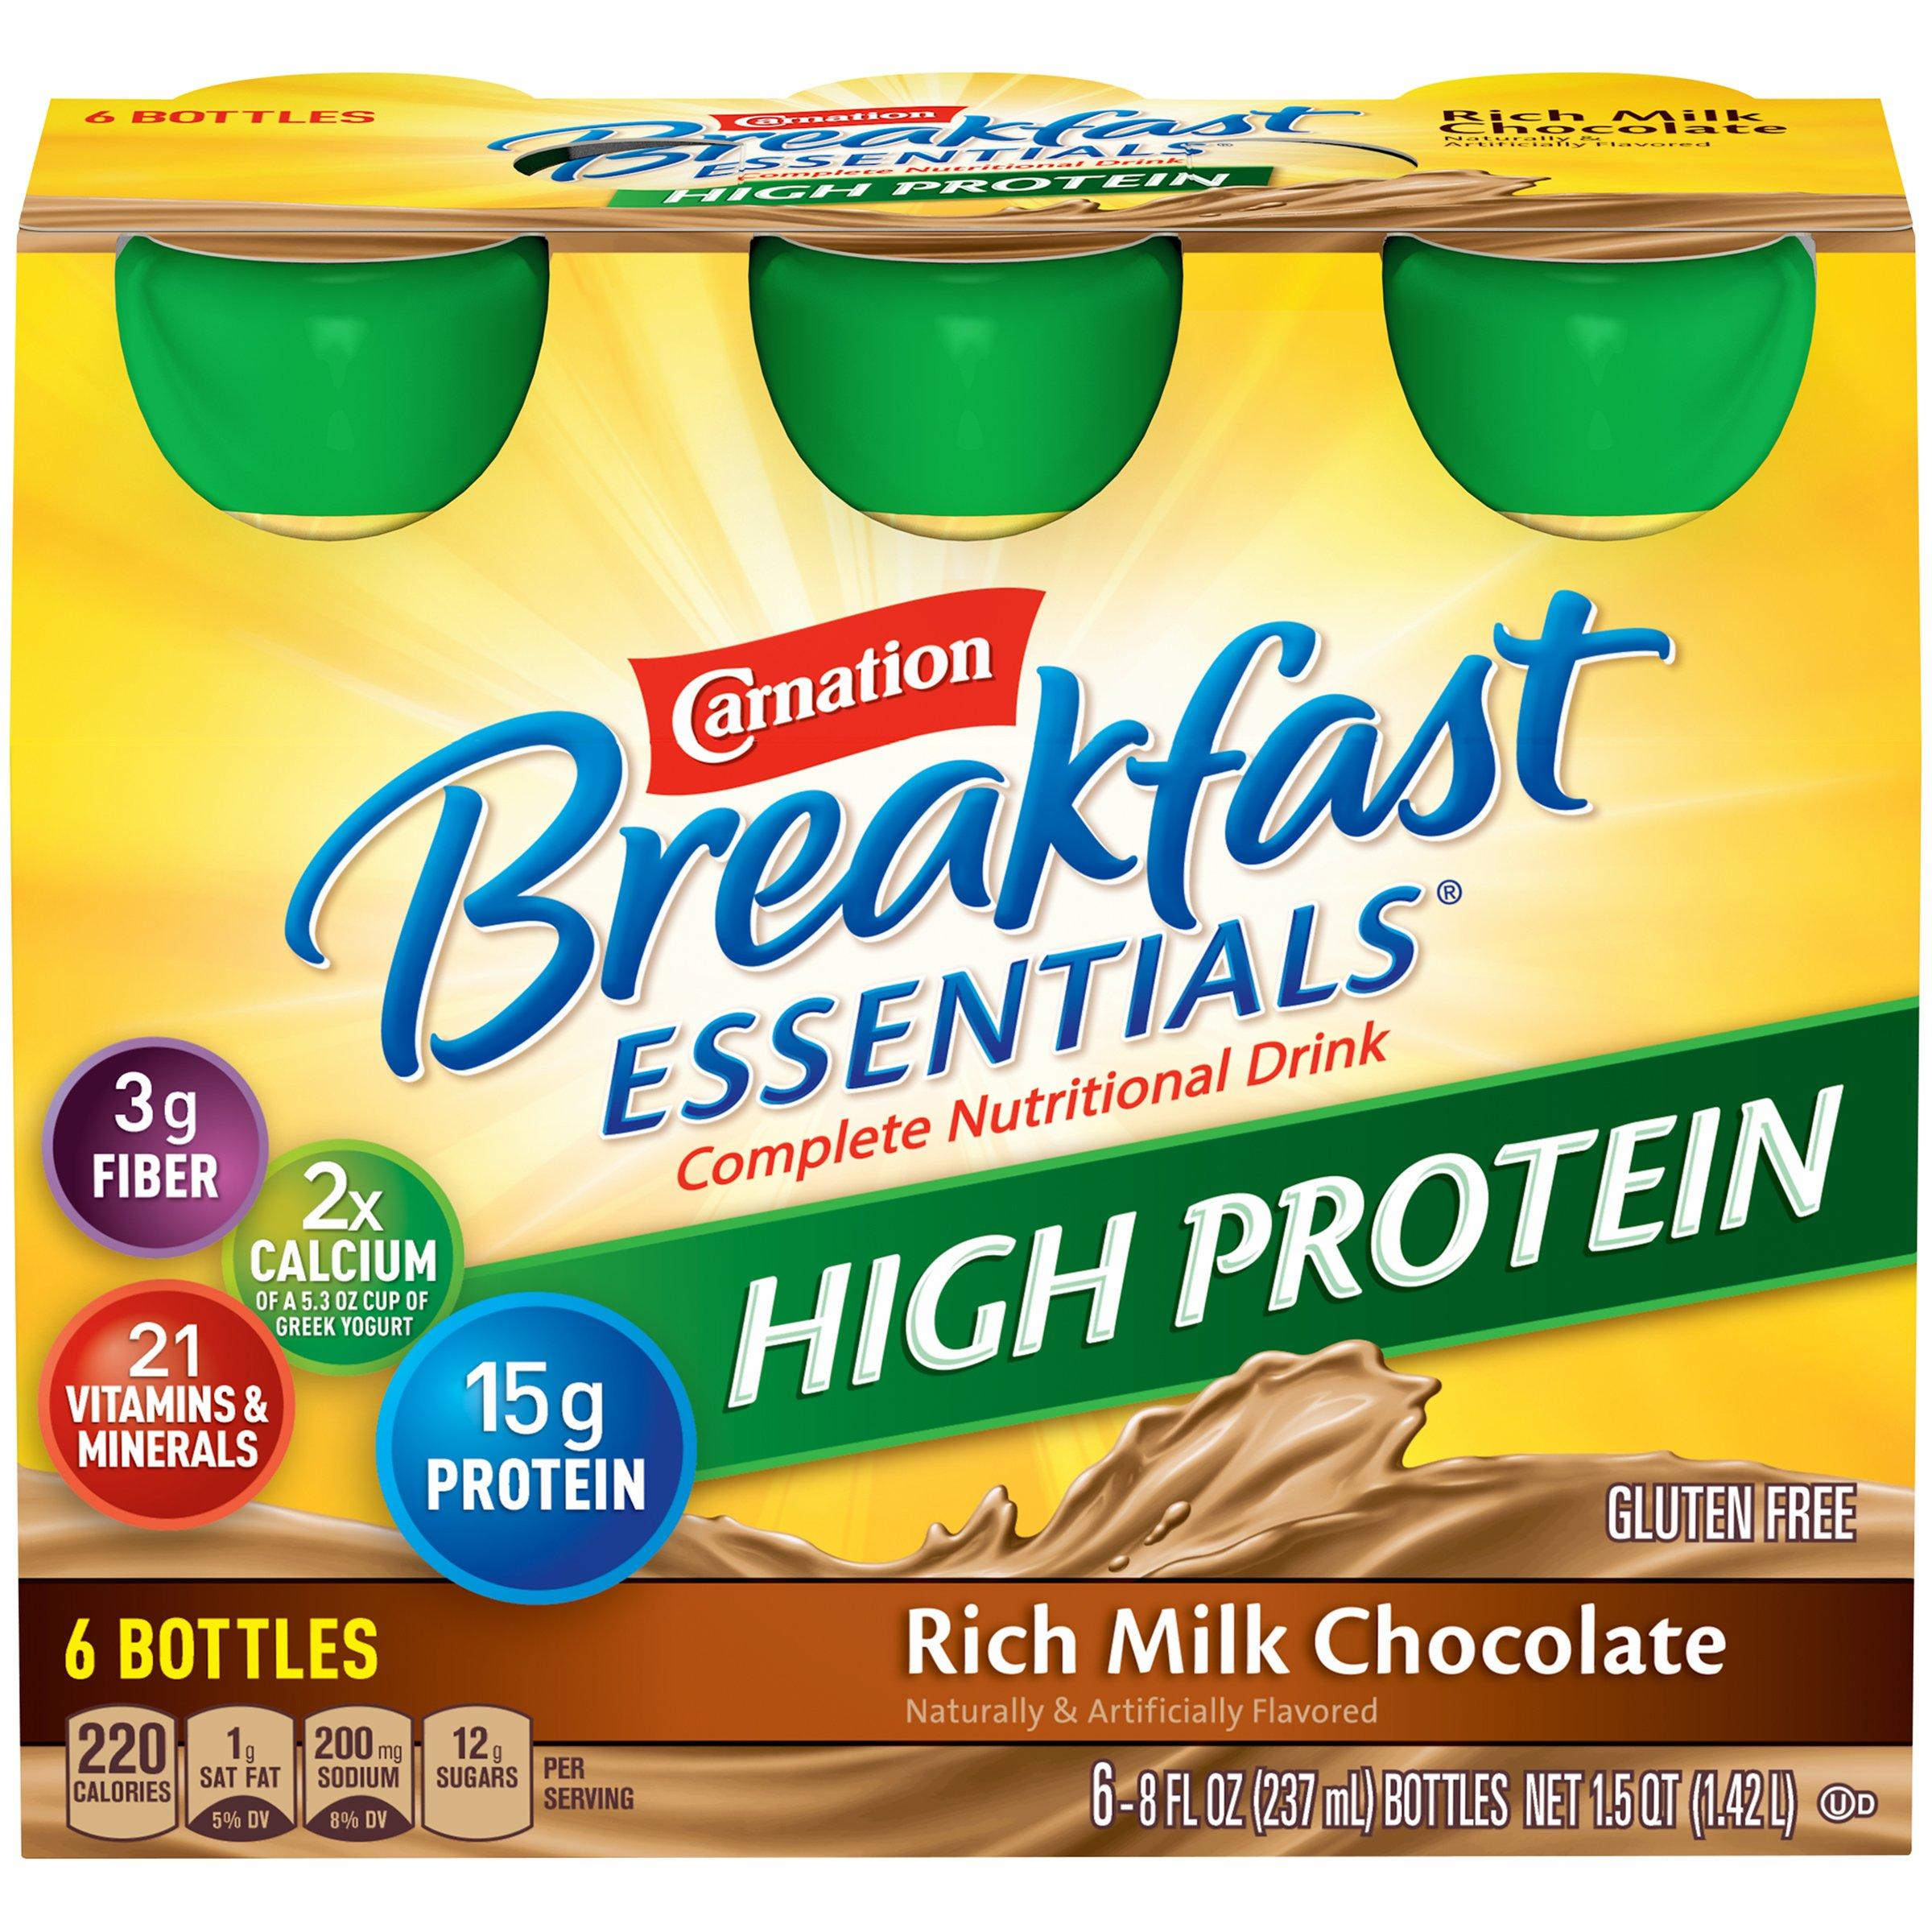 Carnation Breakfast Essentials High Protein Ready To Drink, Rich Milk Chocolate, 8 Fluid Ounce (8 Fl. Oz) by Carnation